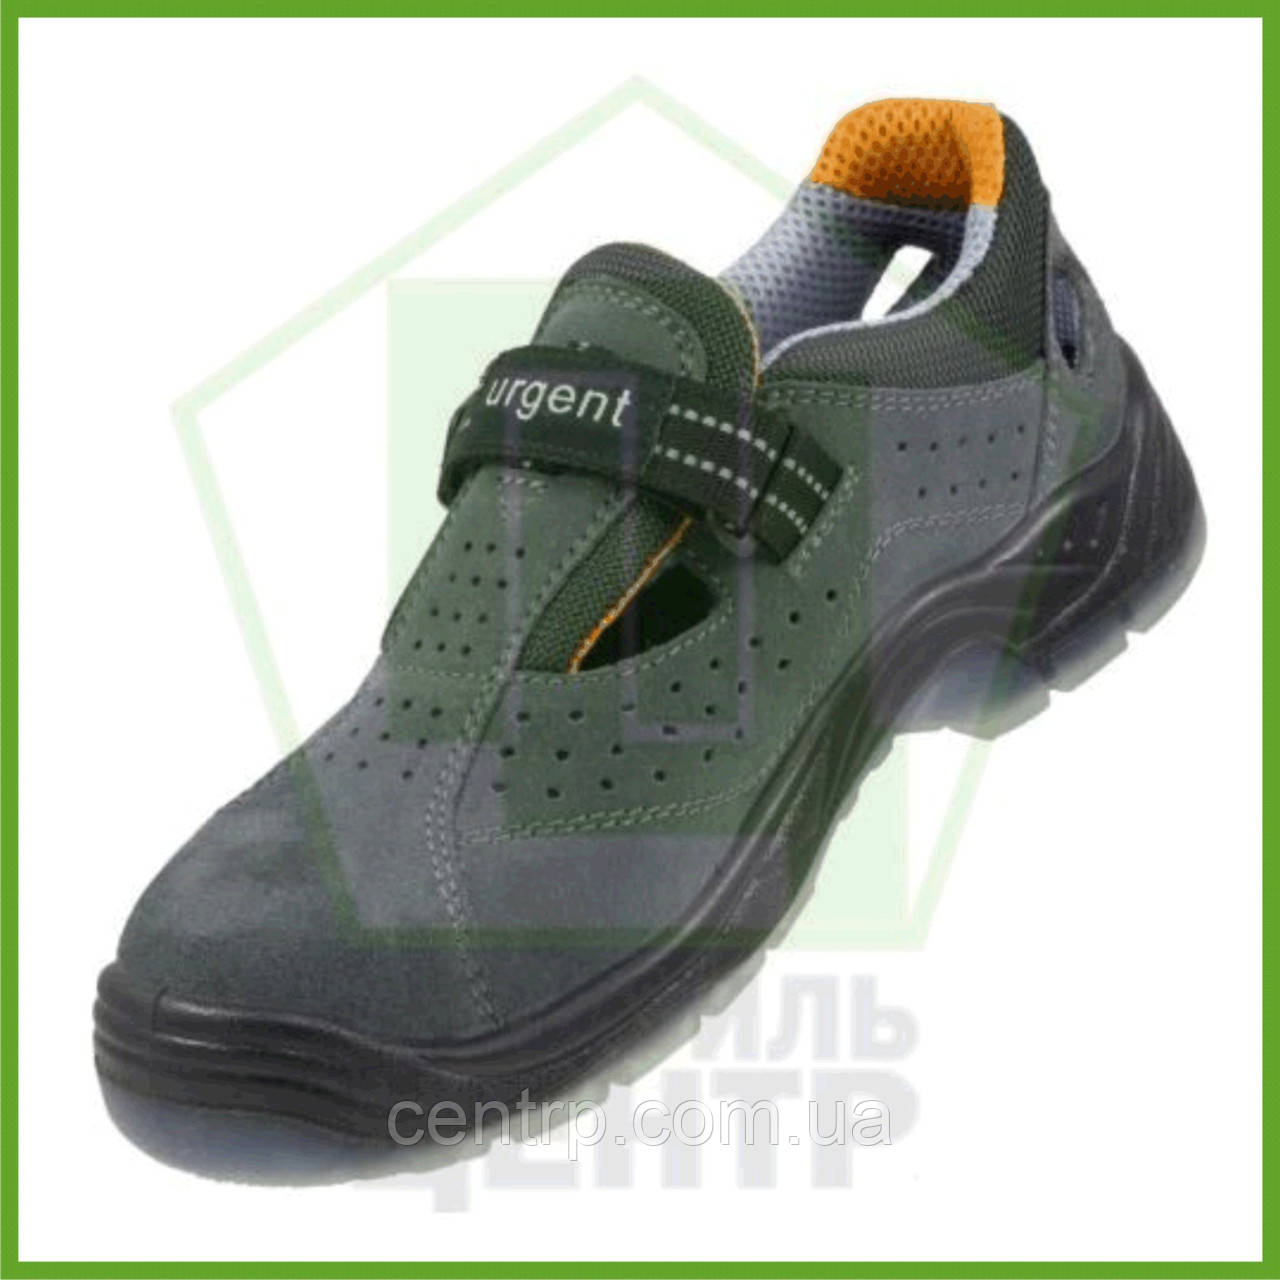 Сандали рабочие кожаные с металлическим носком URGENT 315 S1 TPU (натур.замша)